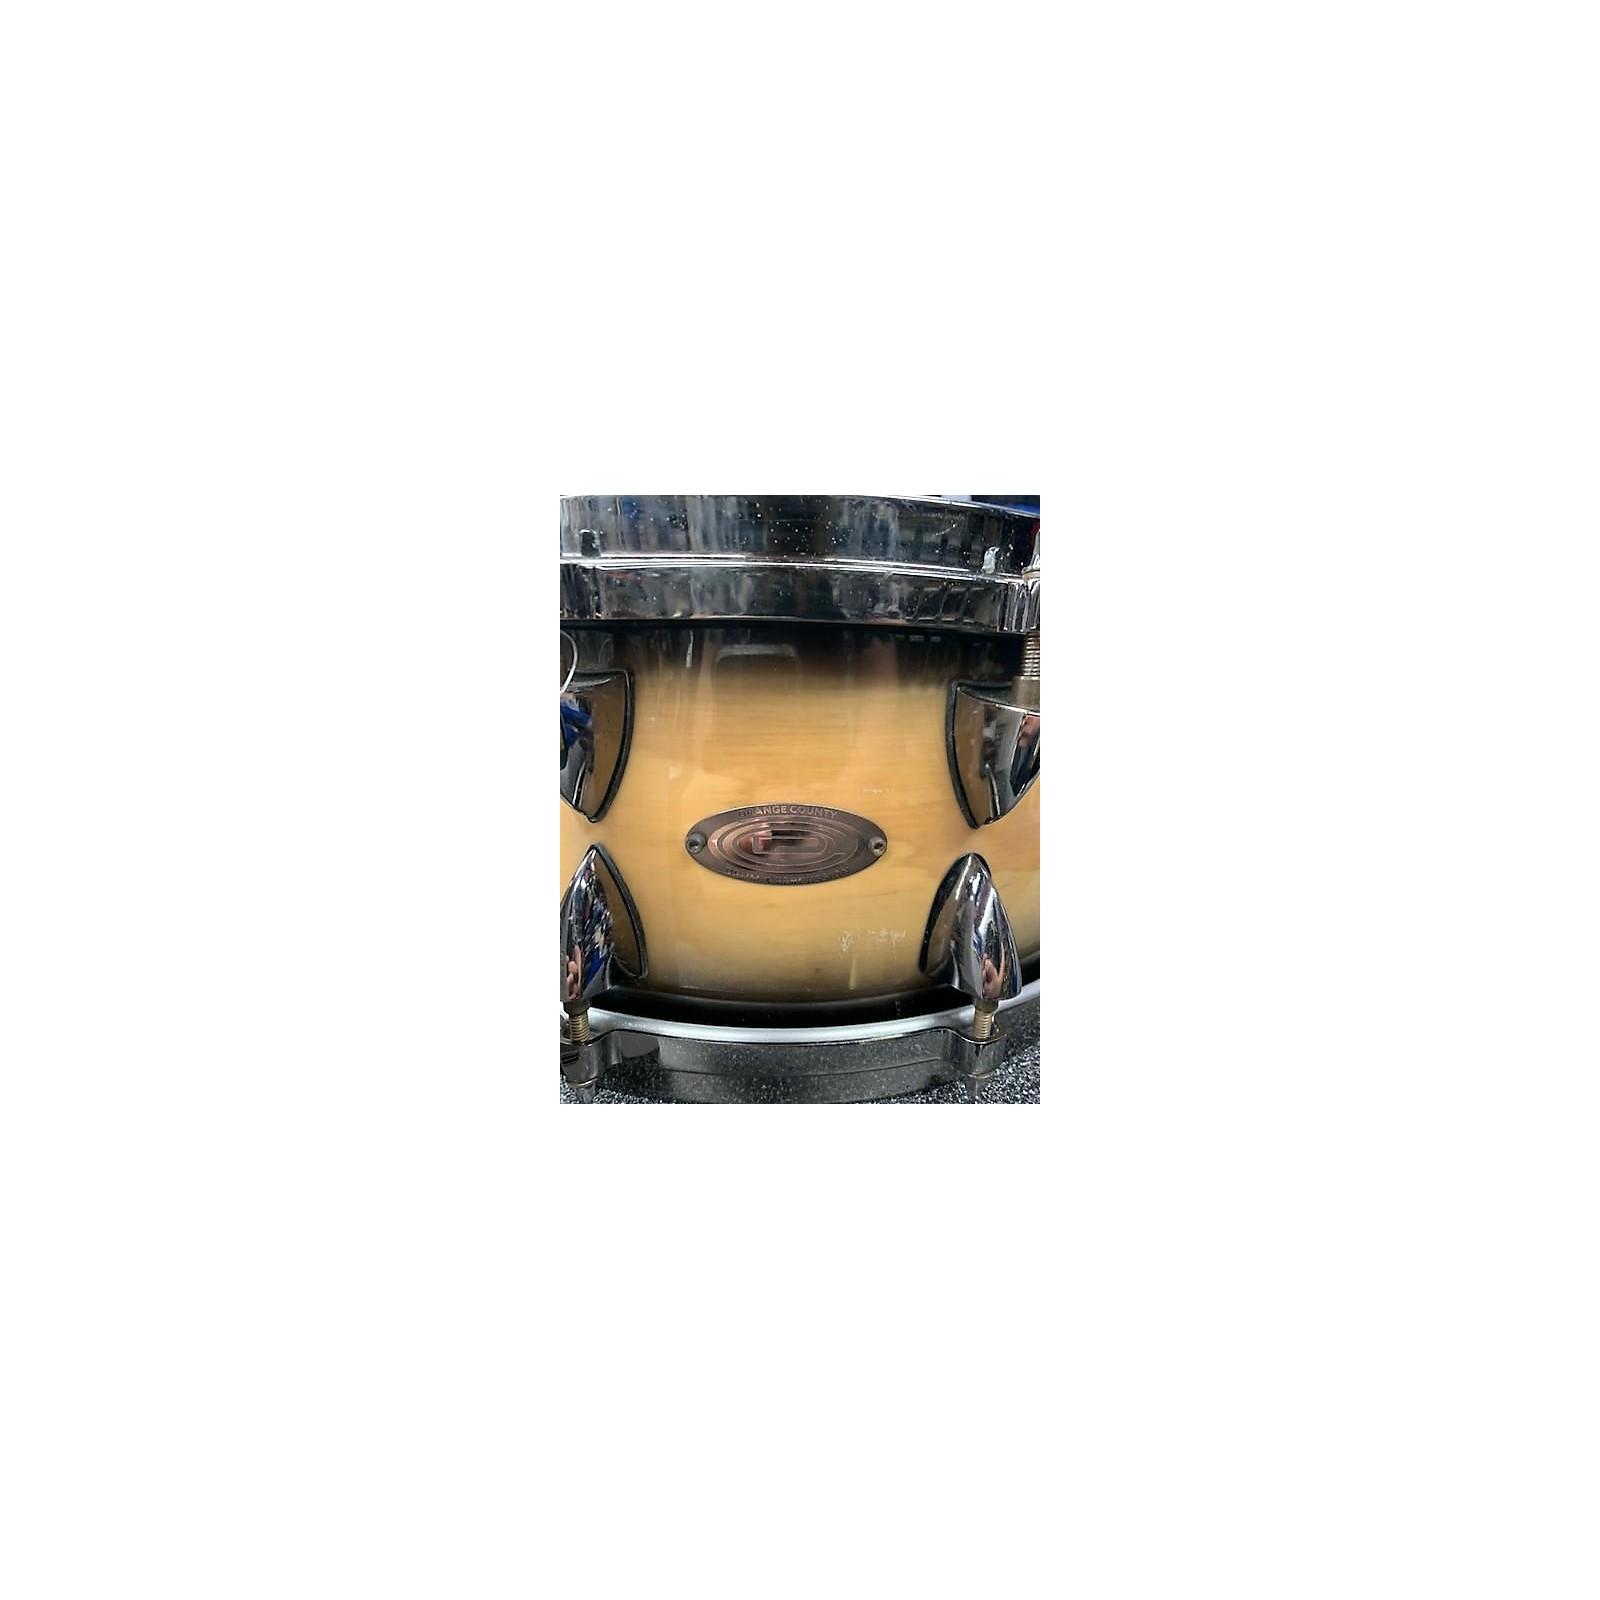 Orange County Drum & Percussion 14X6 Venice Series Snare Drum